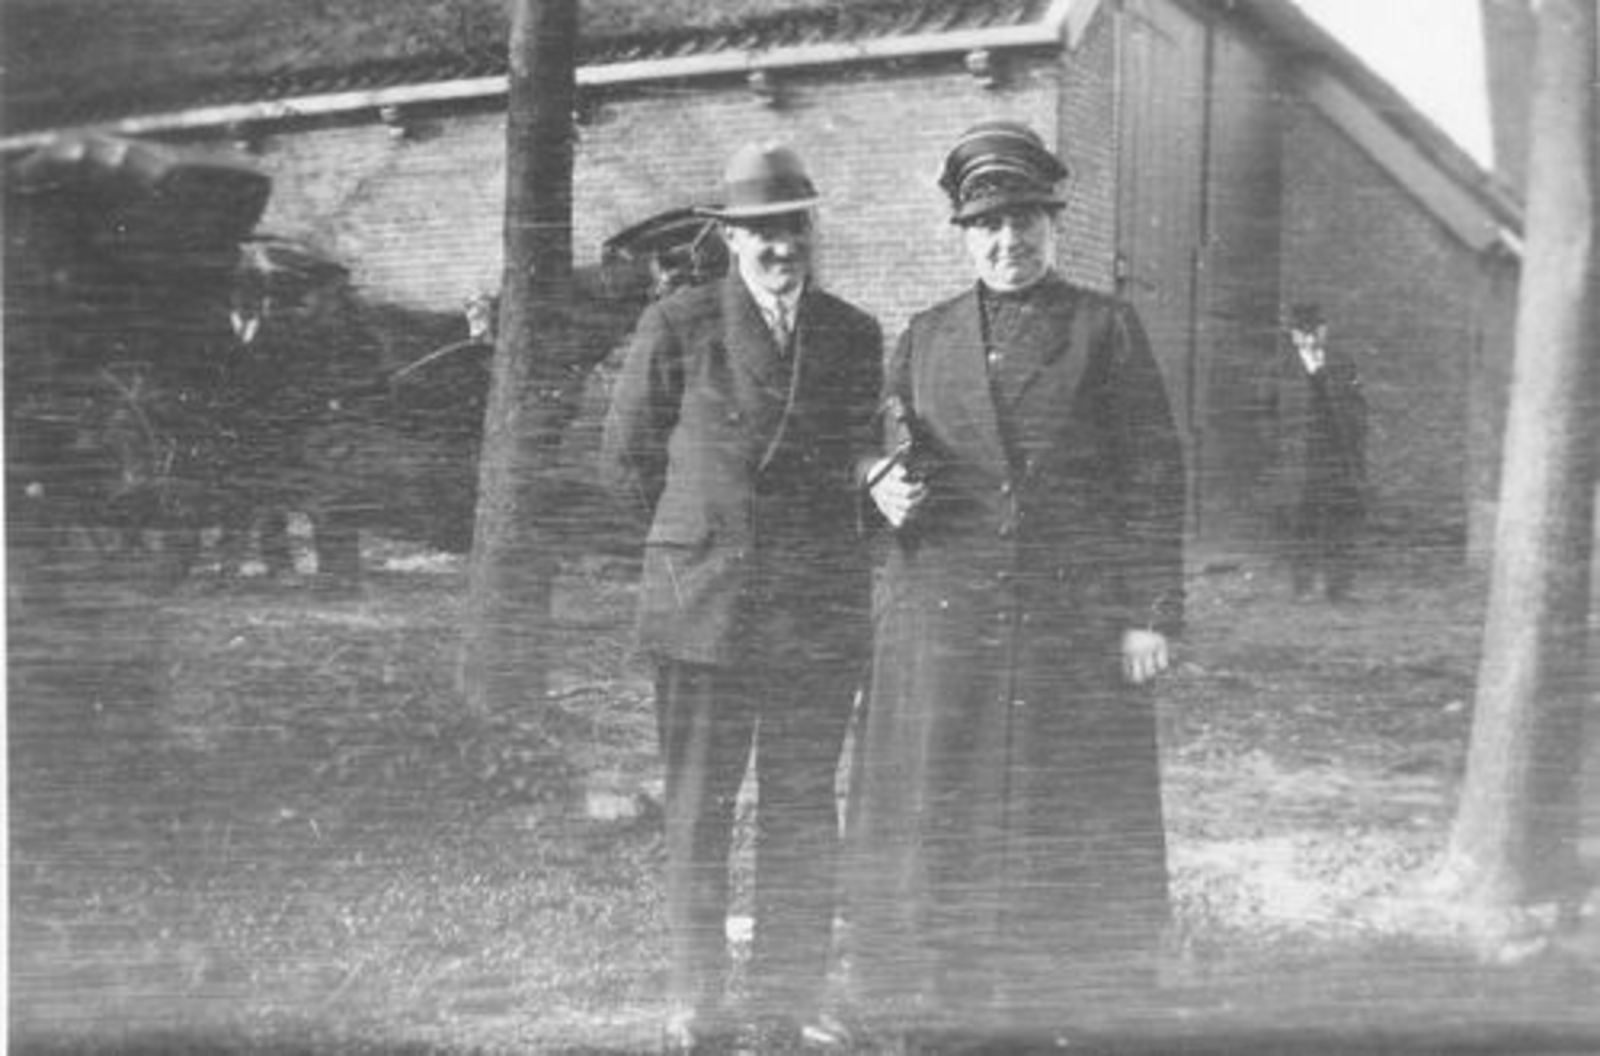 Hulst Adrianus A 1940 trouwt Johanna G Koeckhoven 03